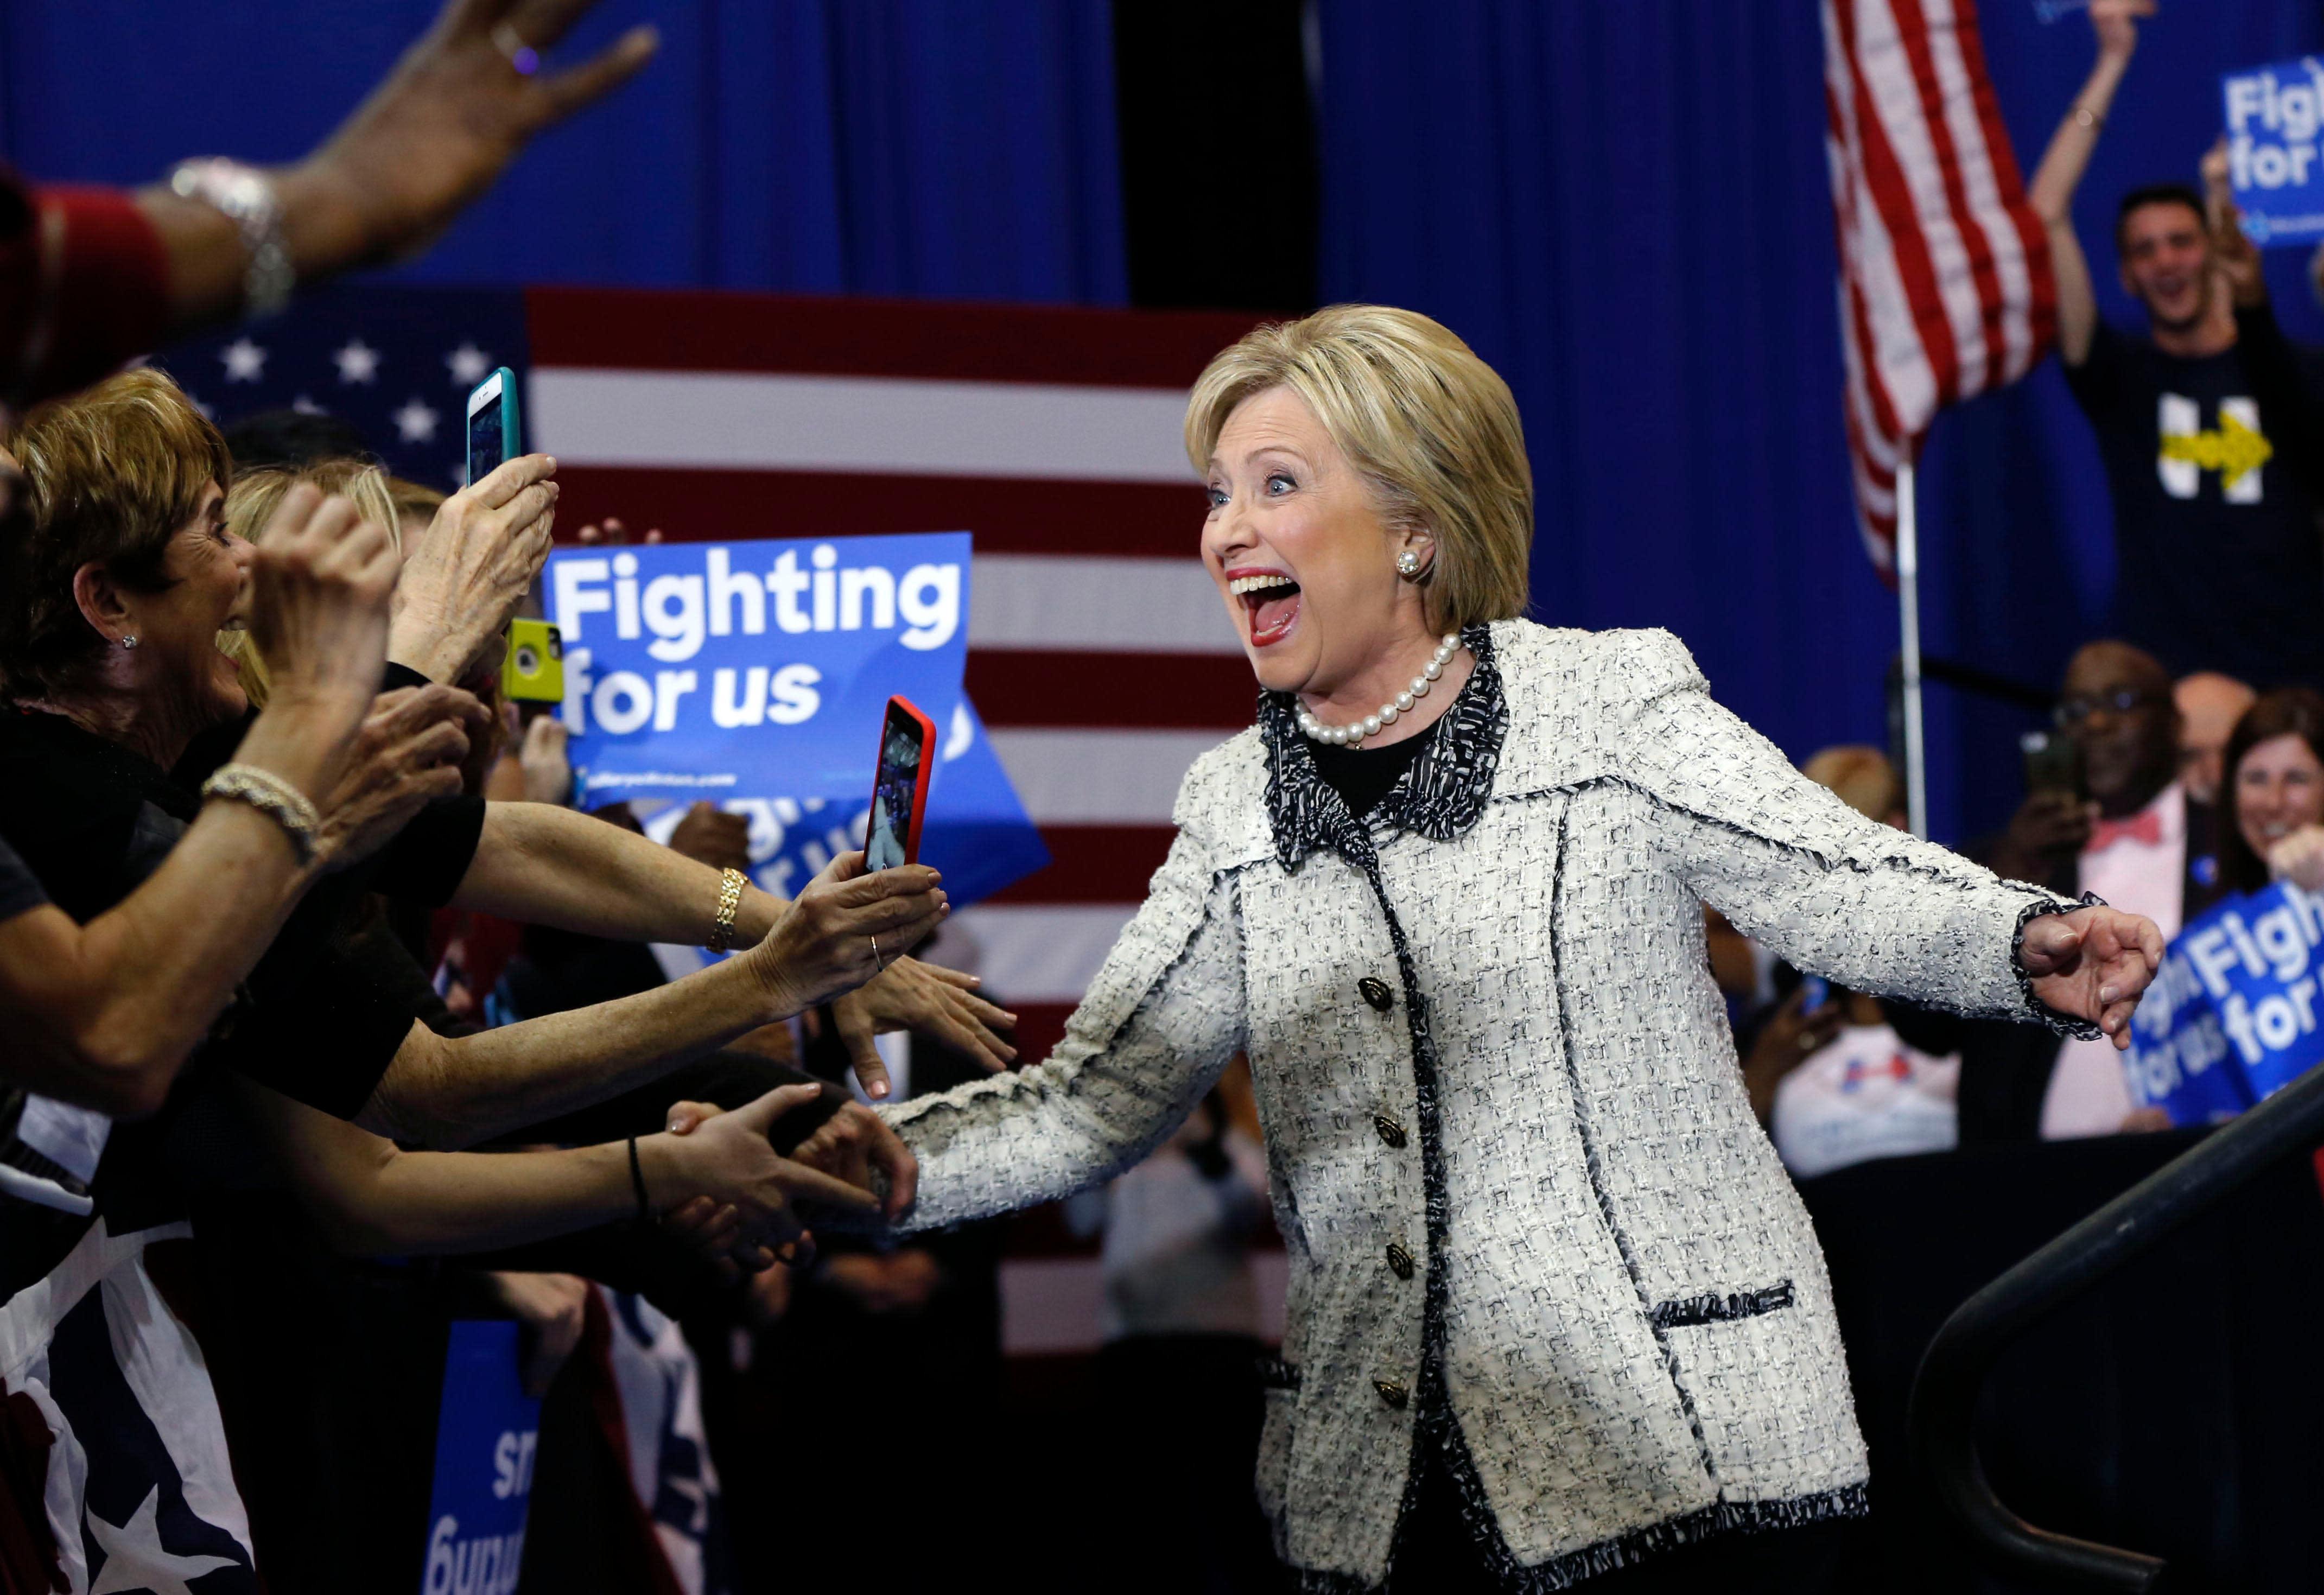 Hillary Clinton wins South Carolina as Bernie Sanders flops with